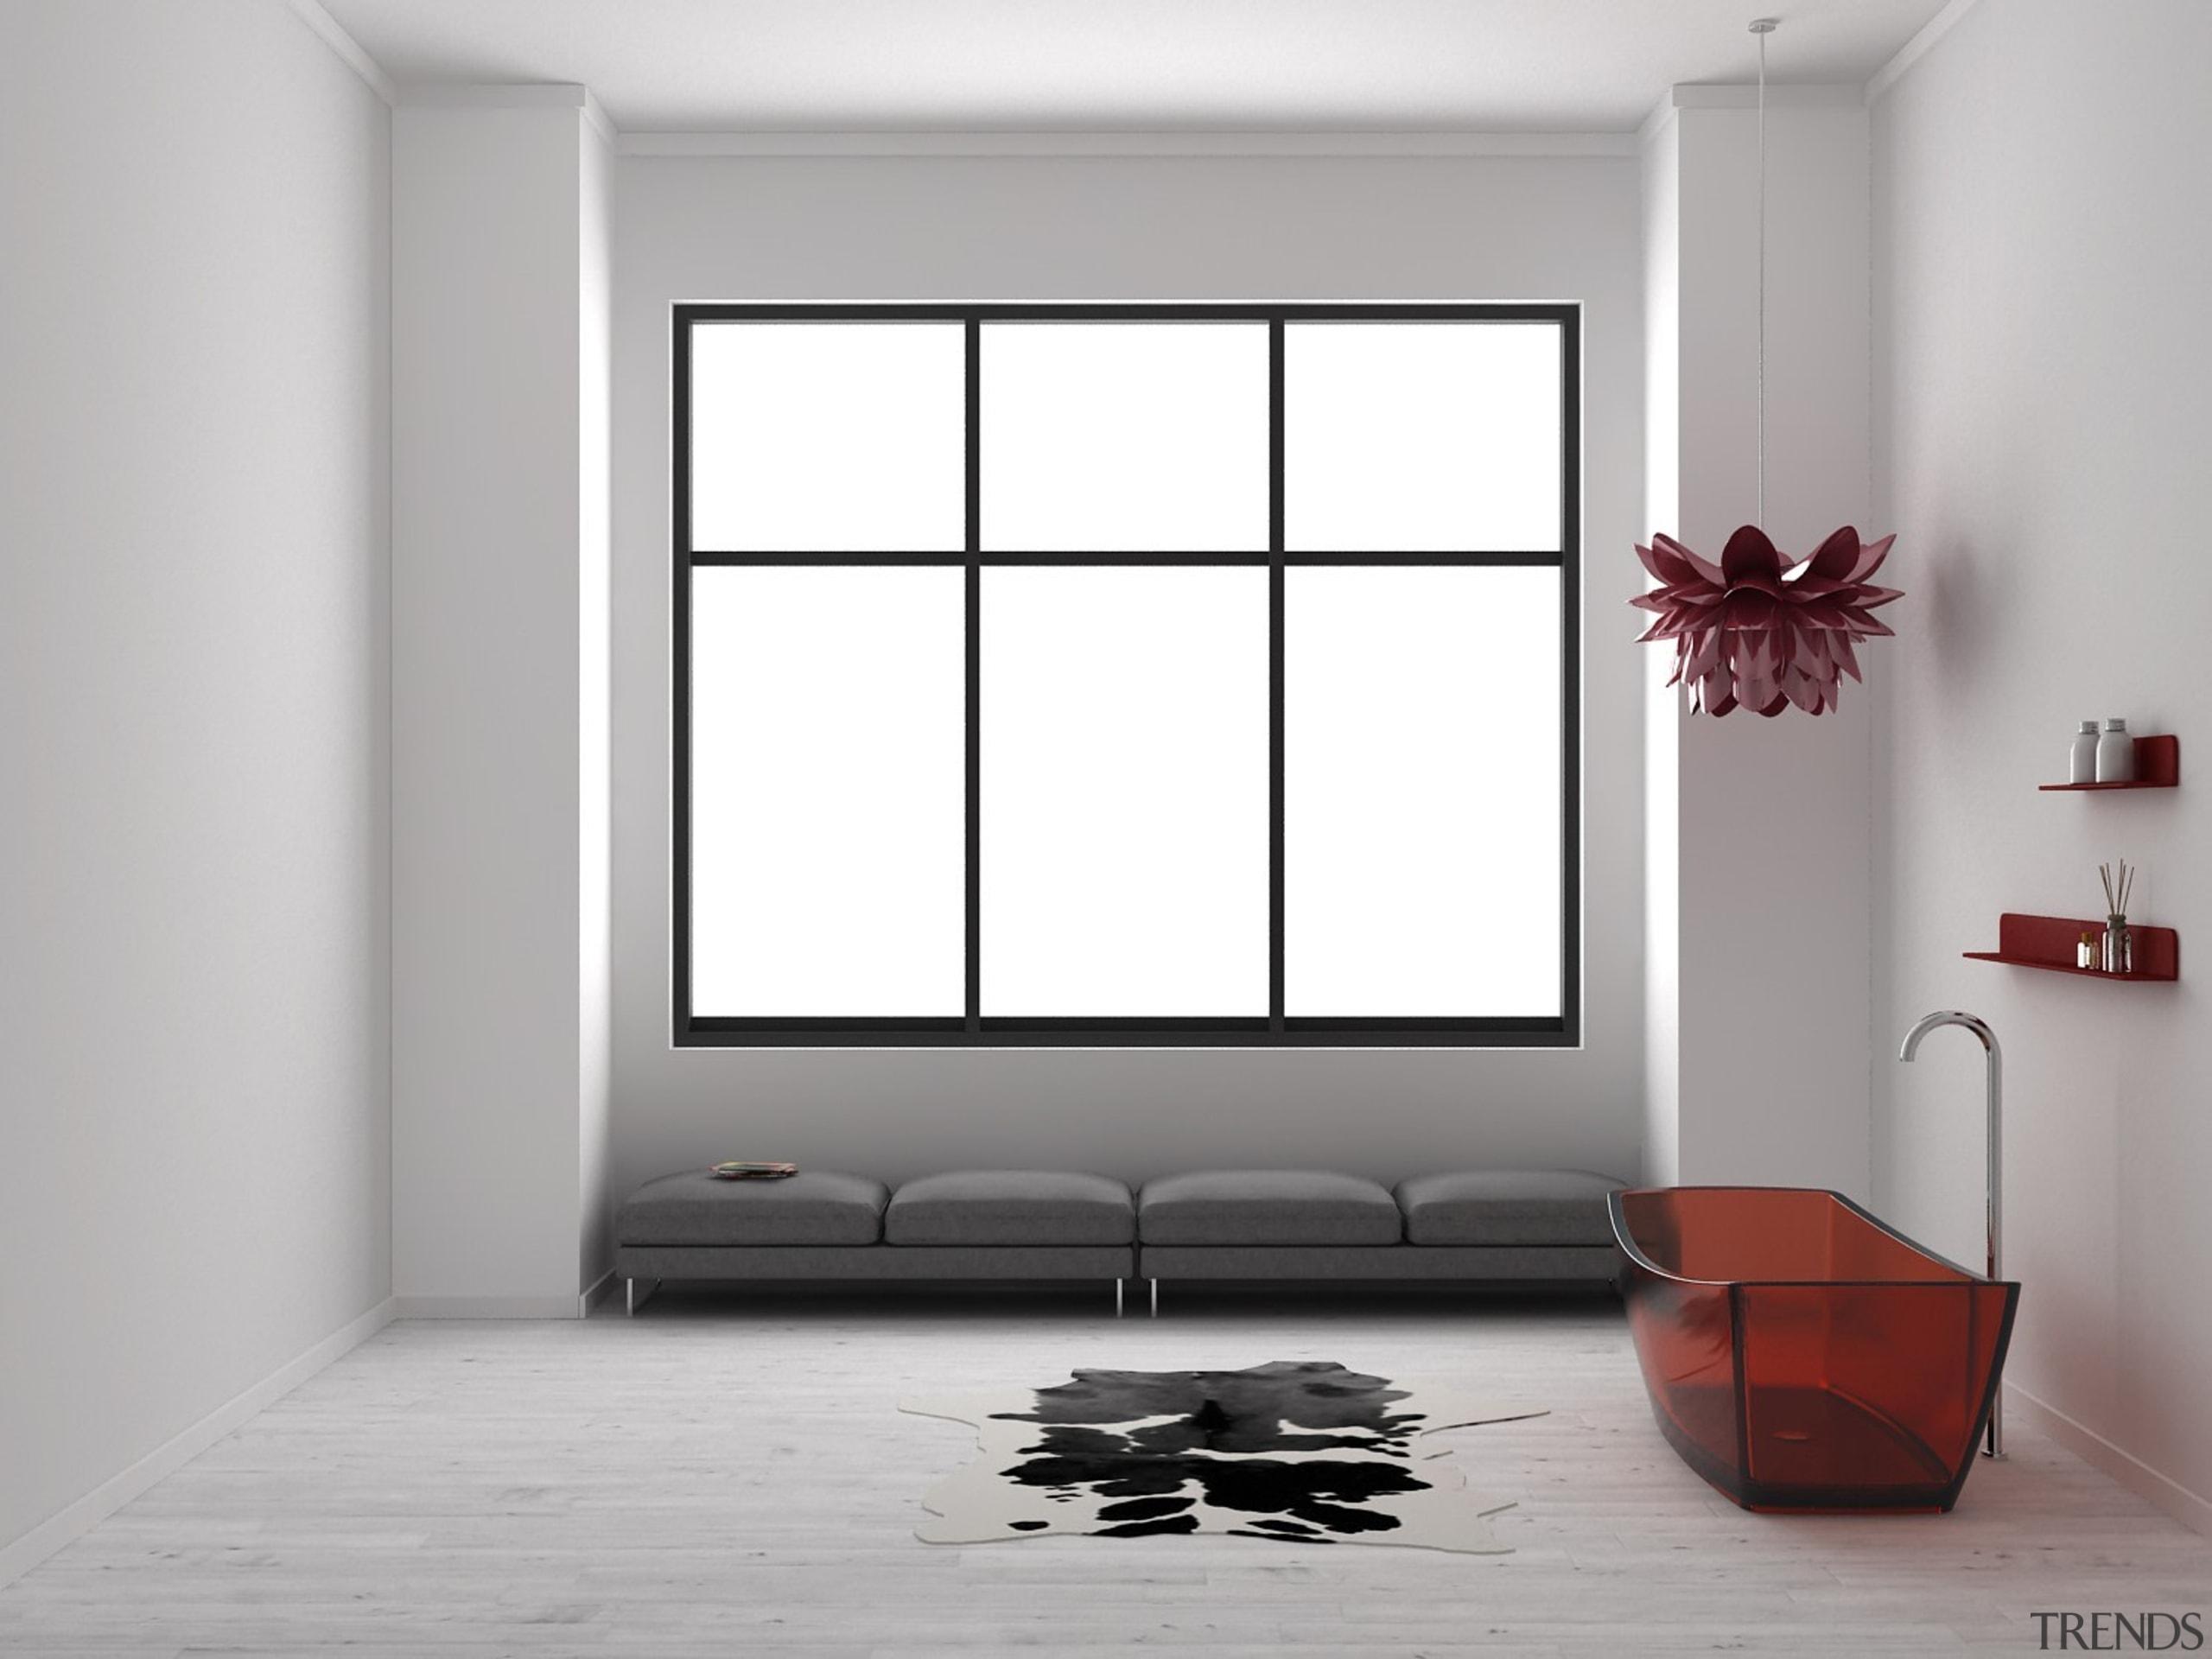 Colour Range Orange - Colour Range Orange - floor, furniture, interior design, room, wall, window, gray, white